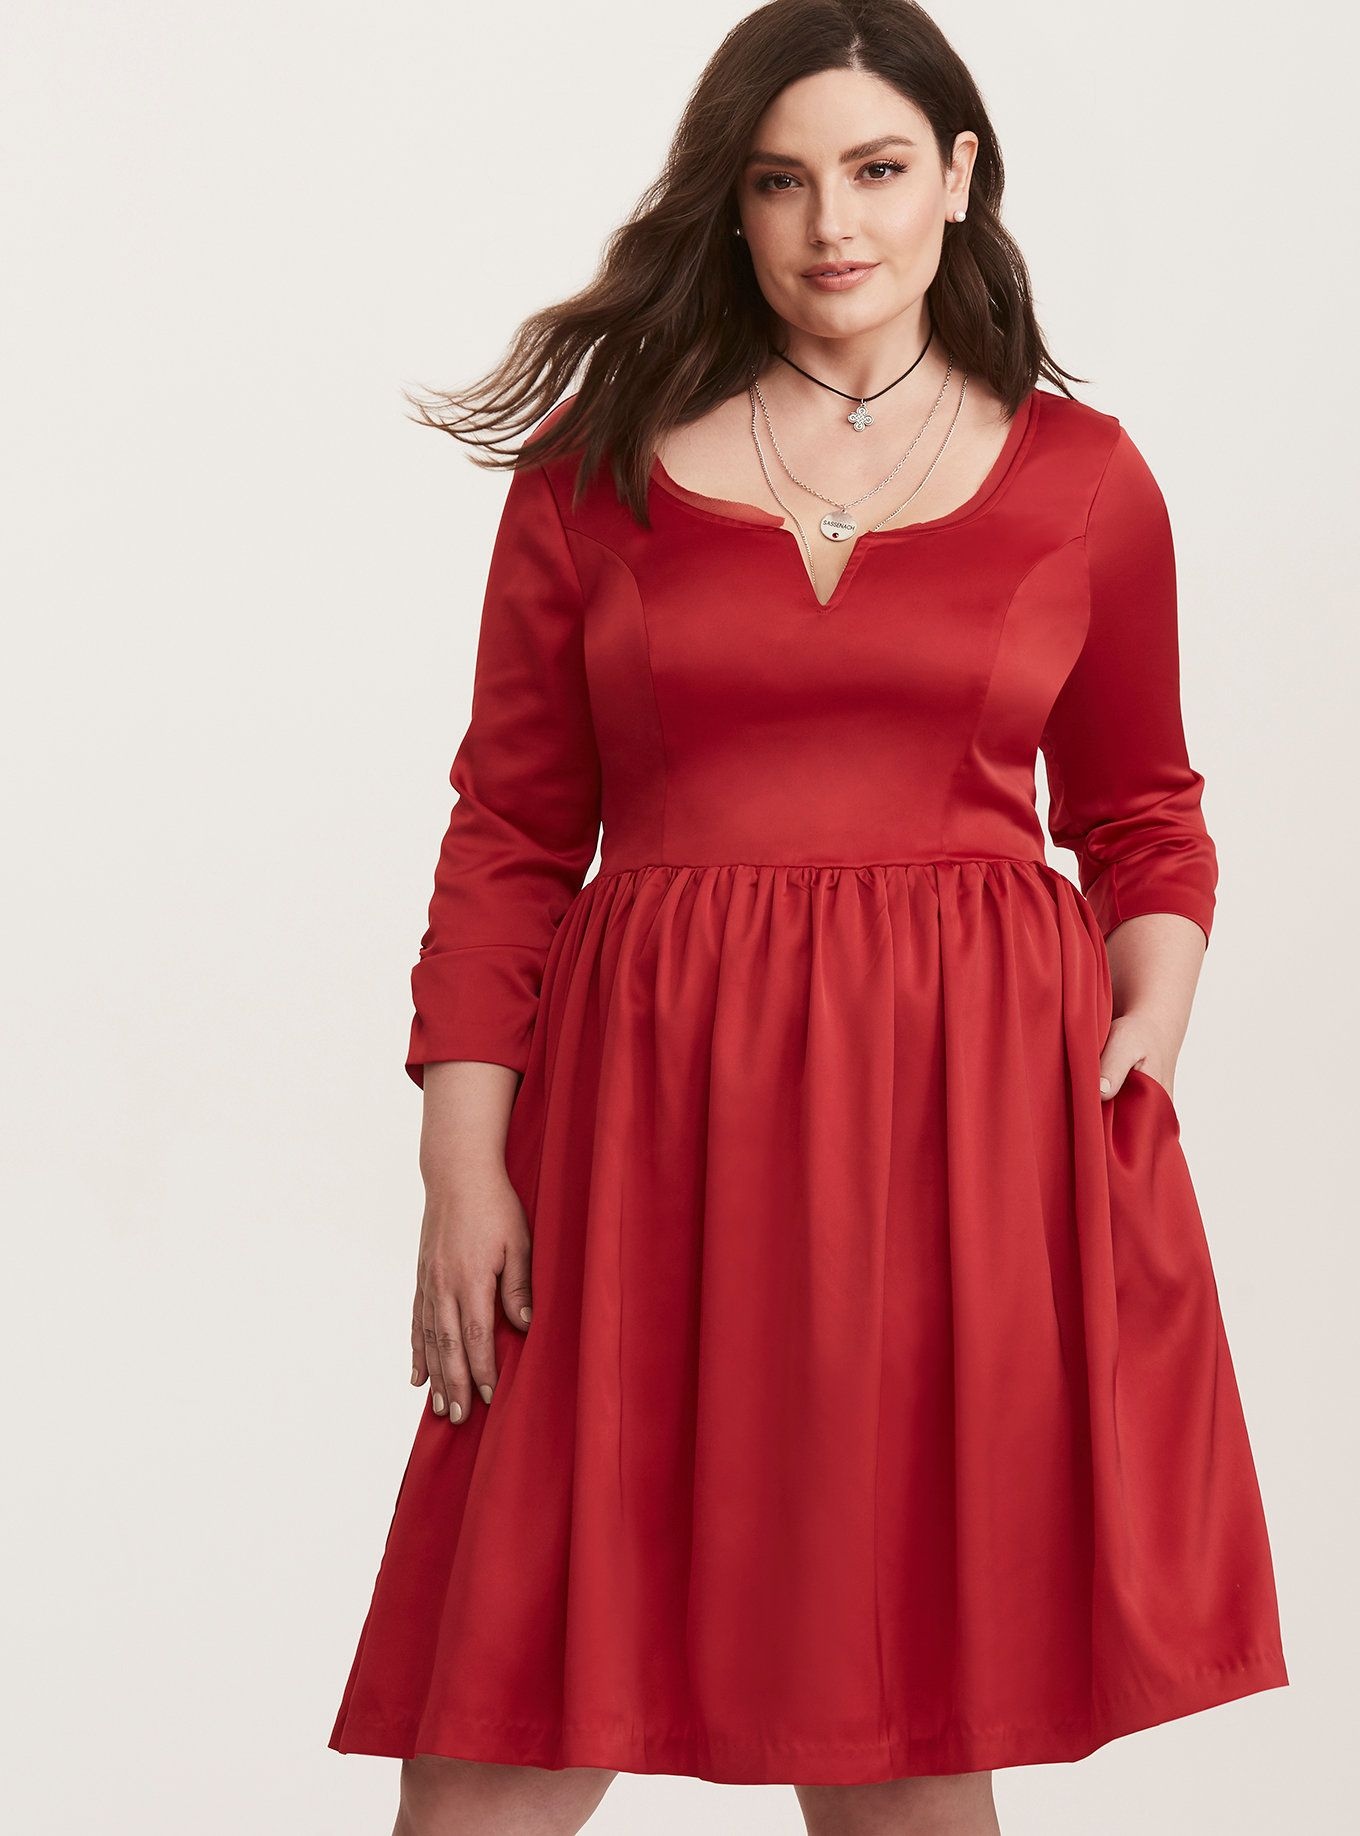 Plus Size Flapper Dress Torrid